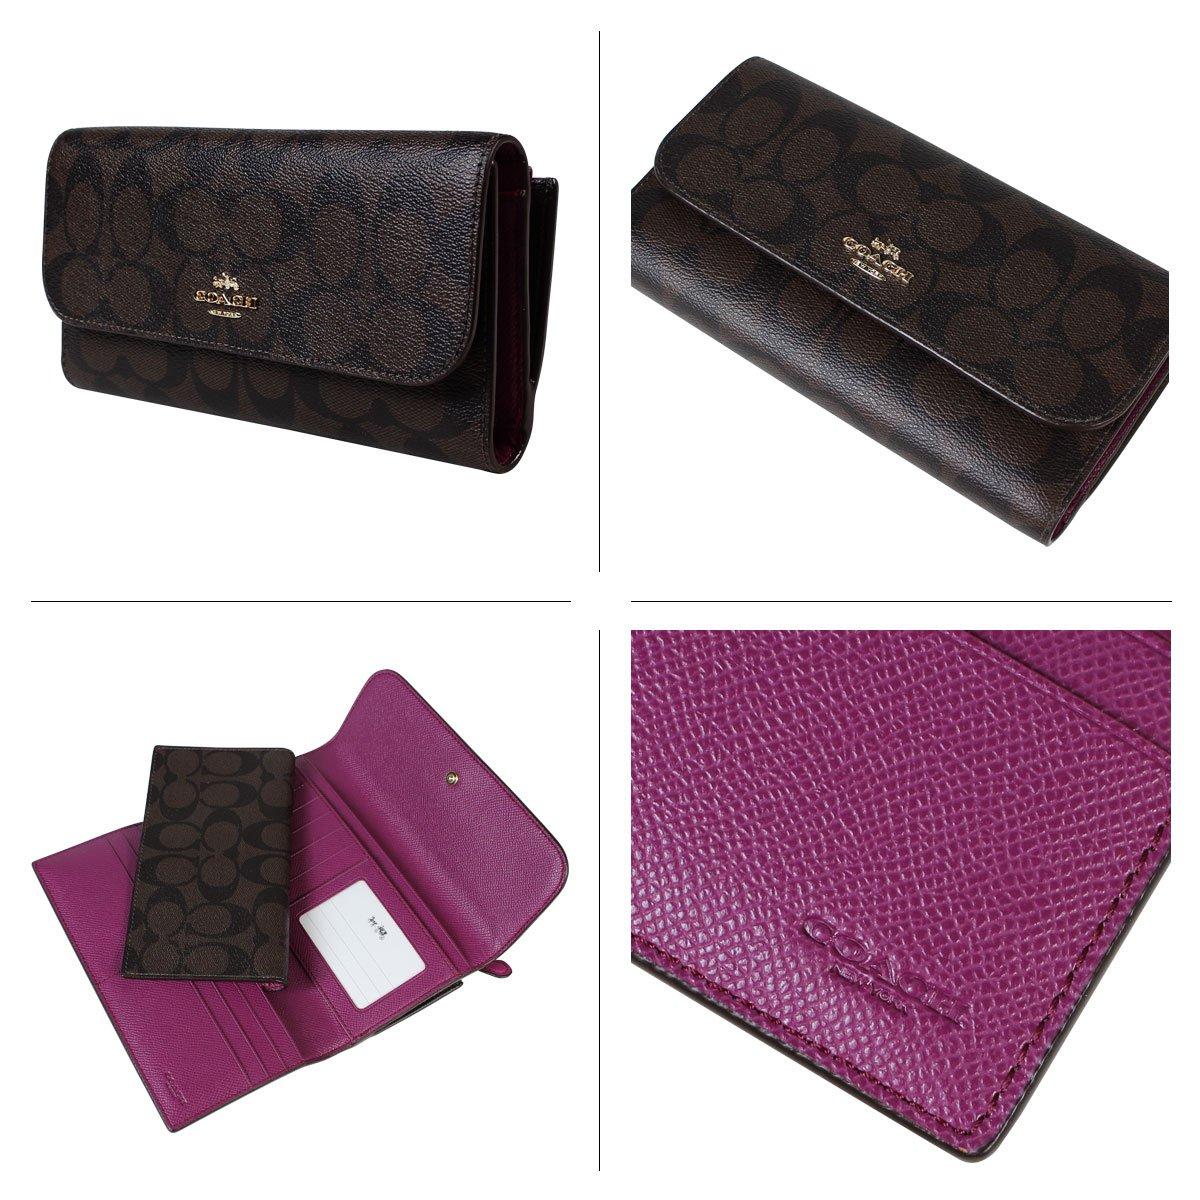 0c953473b8631 Galleon - Coach Signature PVC Coated Canvas Checkbook Wallet